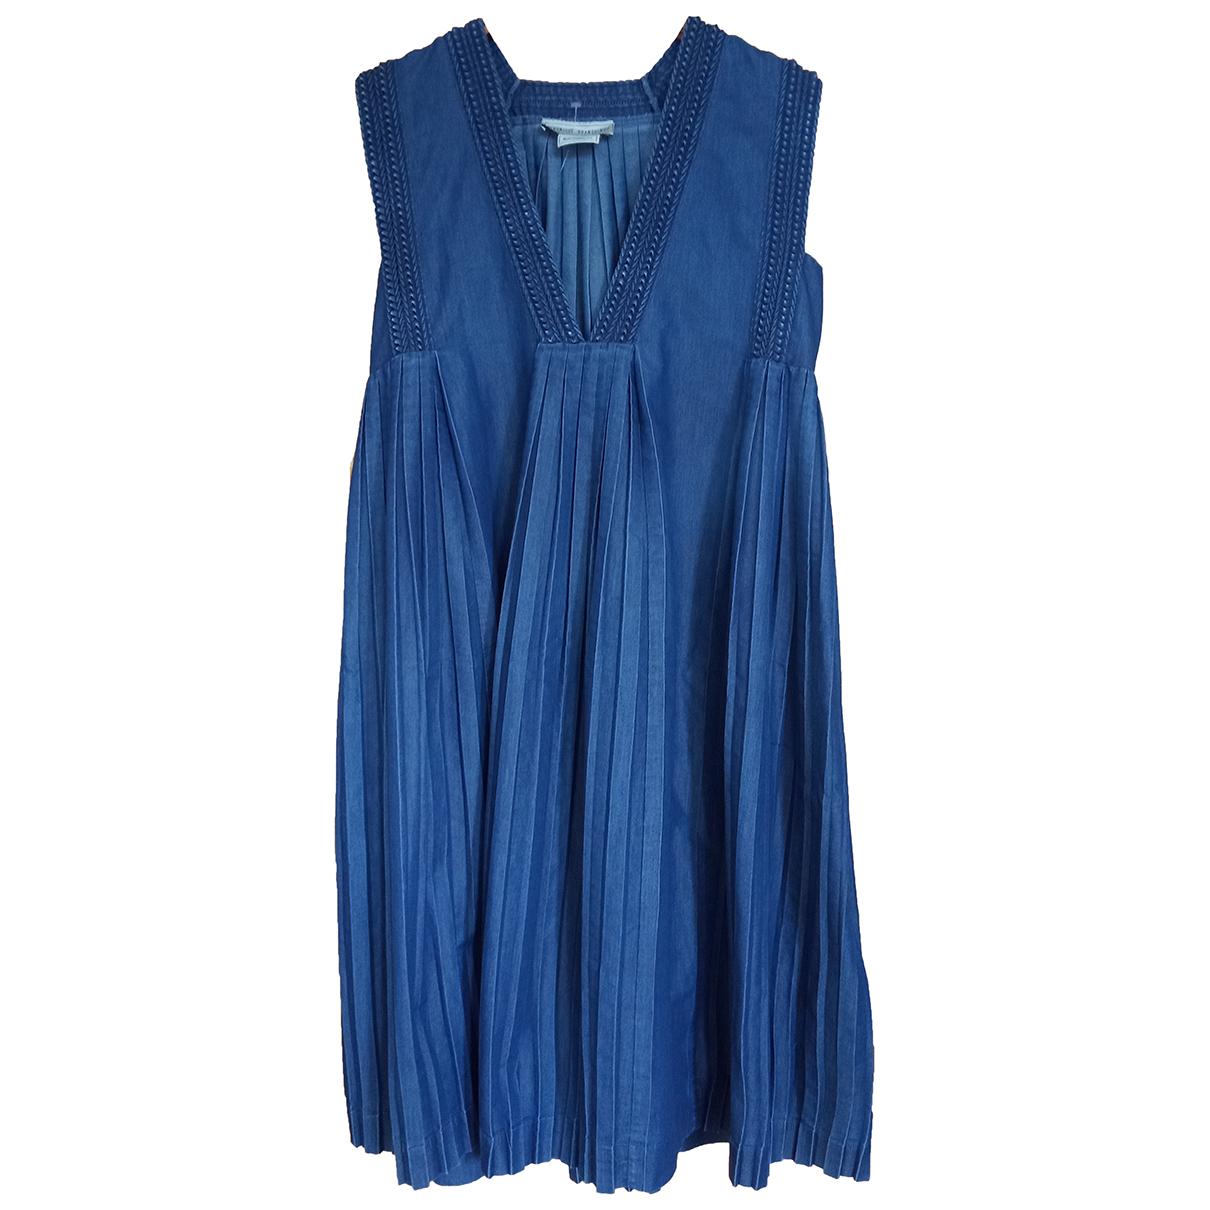 Veronique Branquinho \N Kleid in  Blau Denim - Jeans